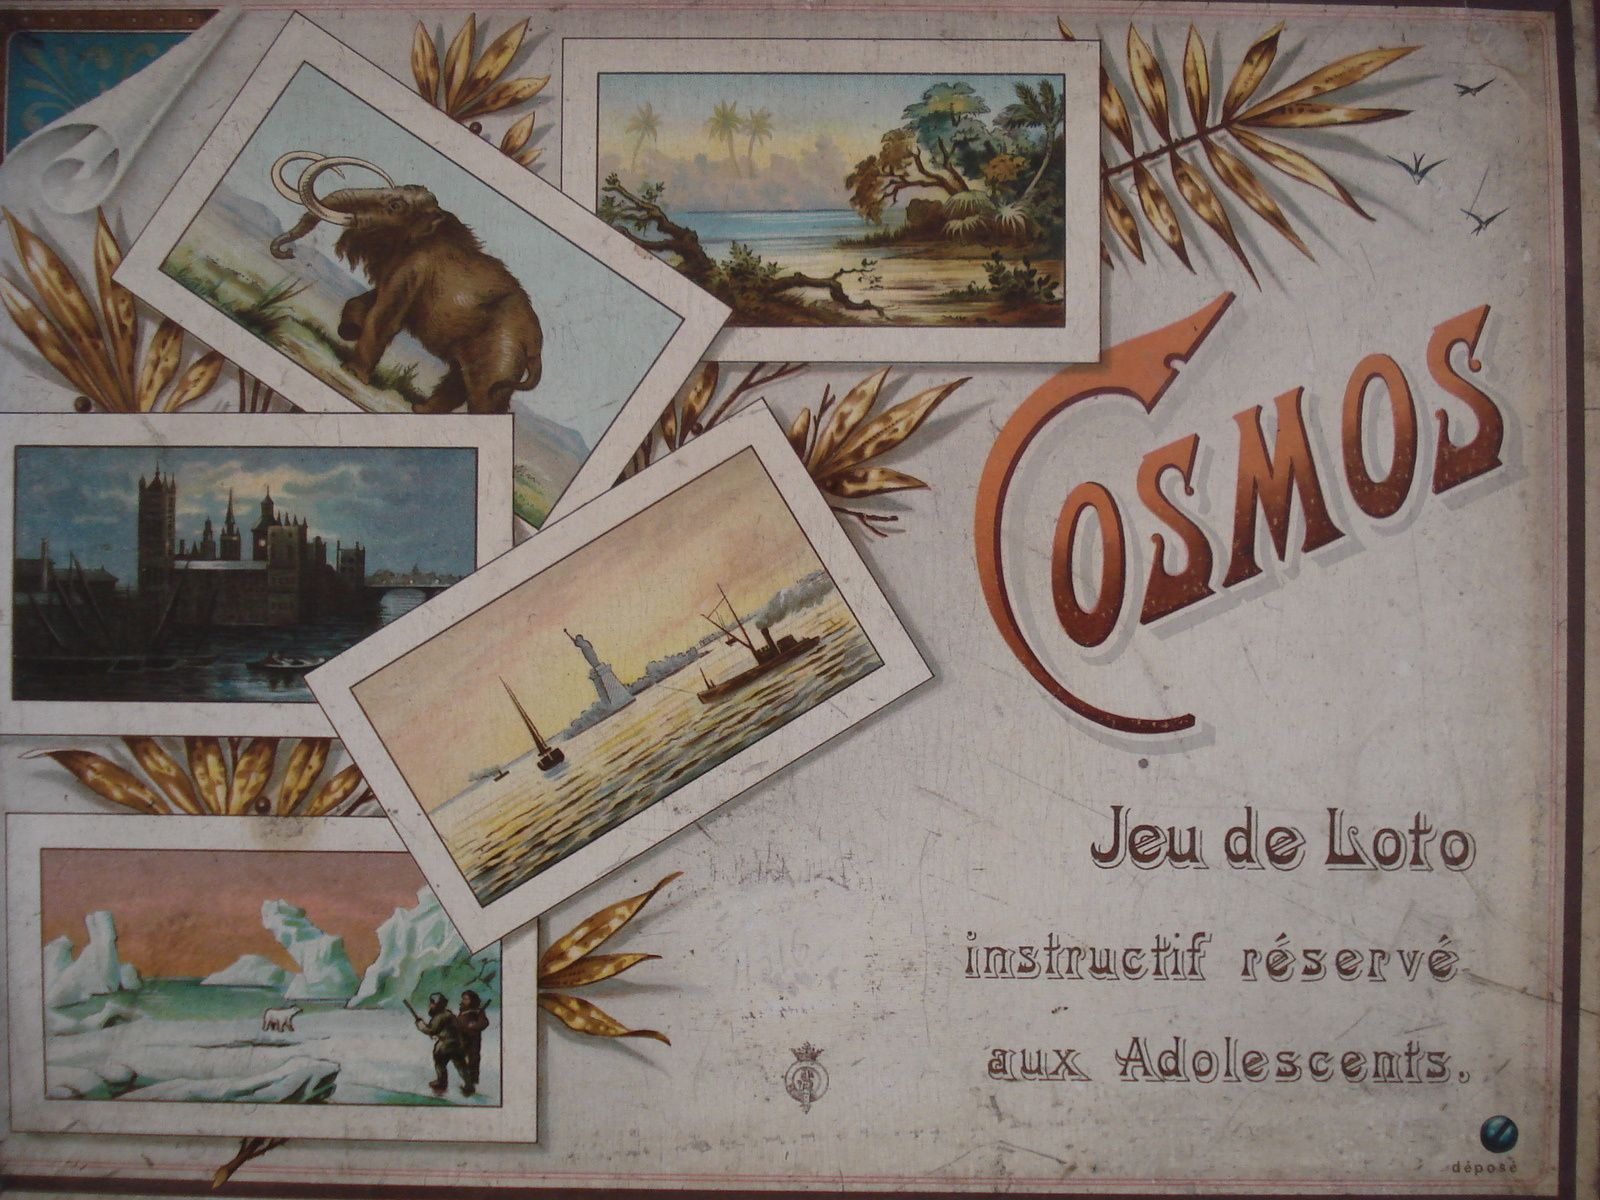 Cosmos, jeu de loto géographique